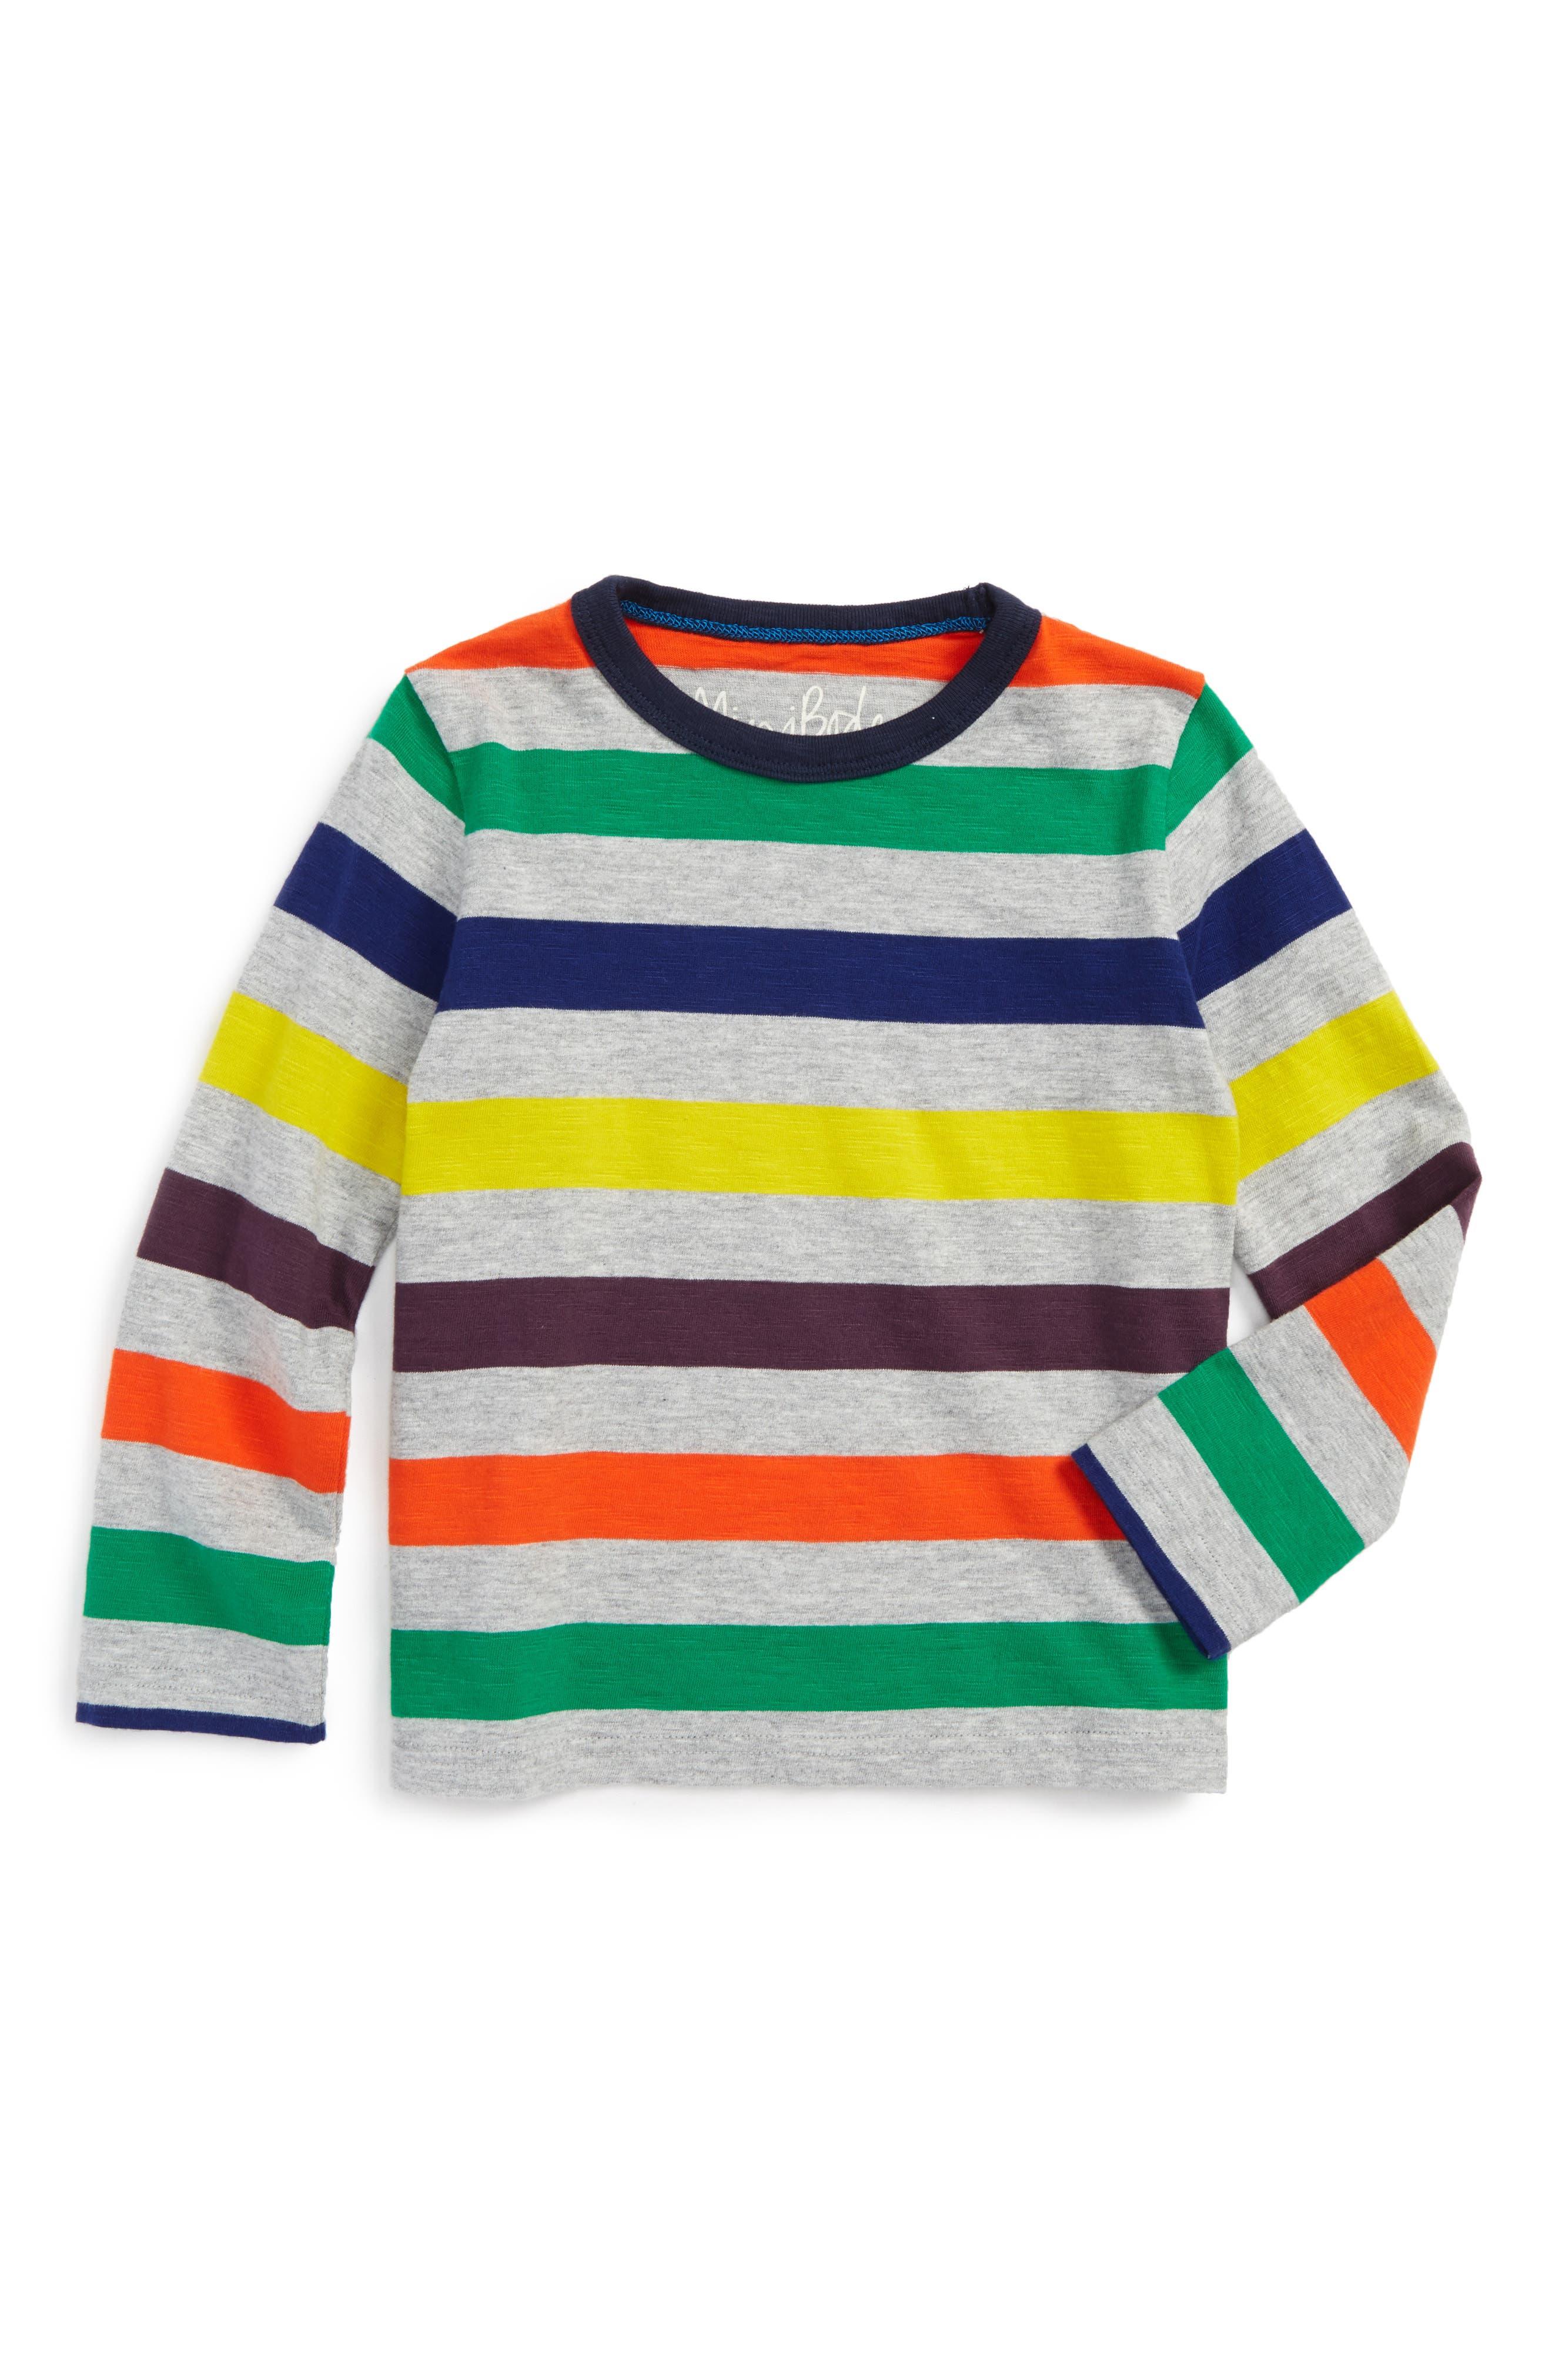 Main Image - Mini Boden Stripe Long Sleeve T-Shirt (Toddler Boys, Little Boys & Big Boys)